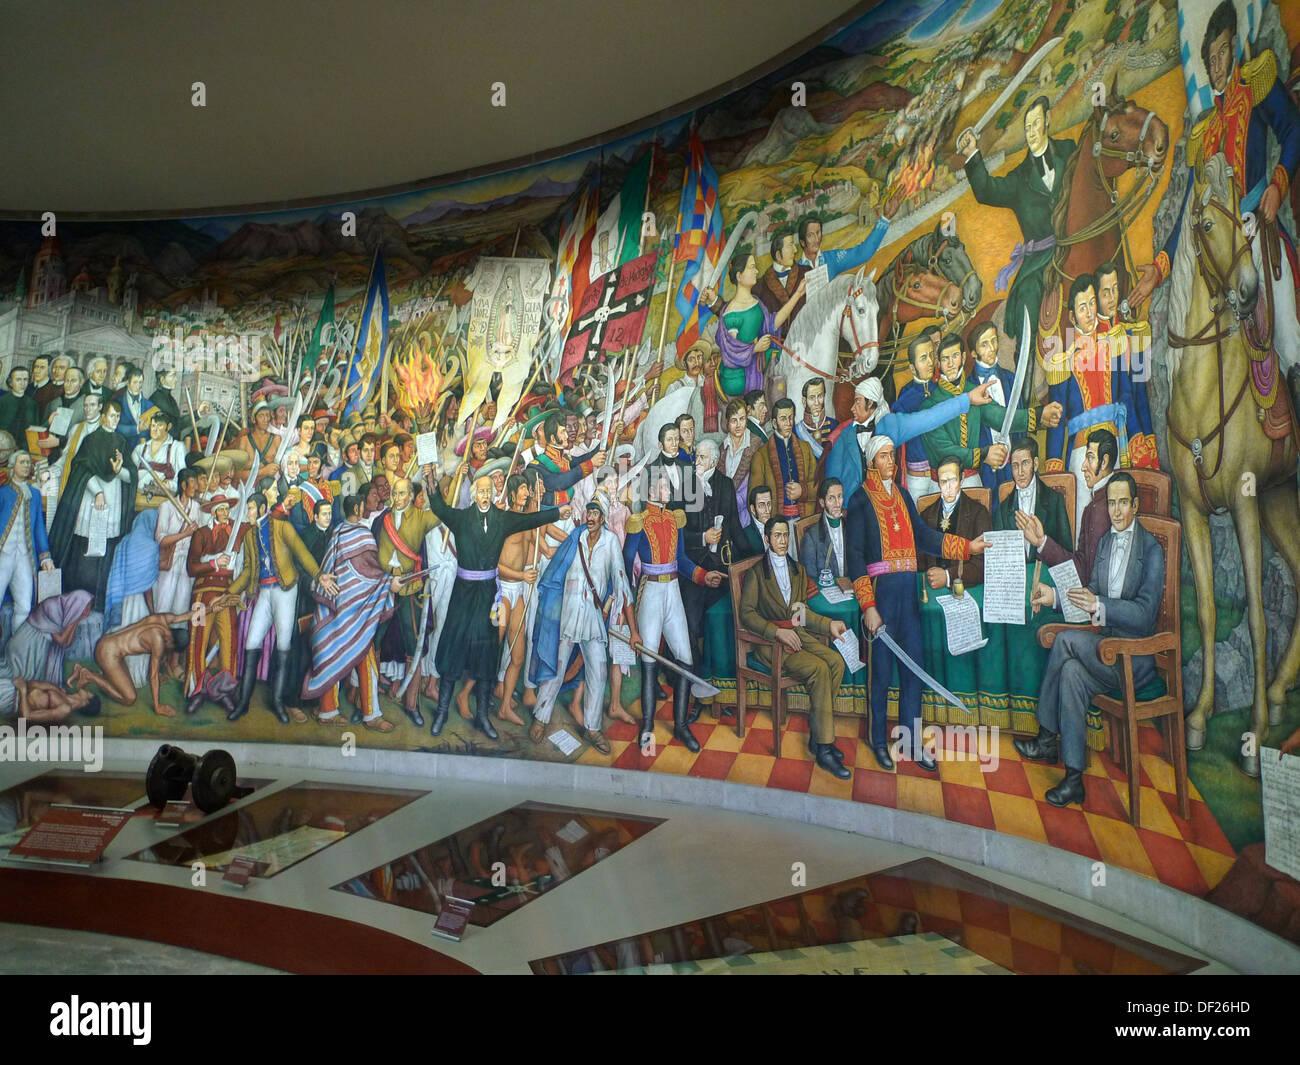 Castillo de chapultepec mural paintings ciudad de m xico for Mural en francais